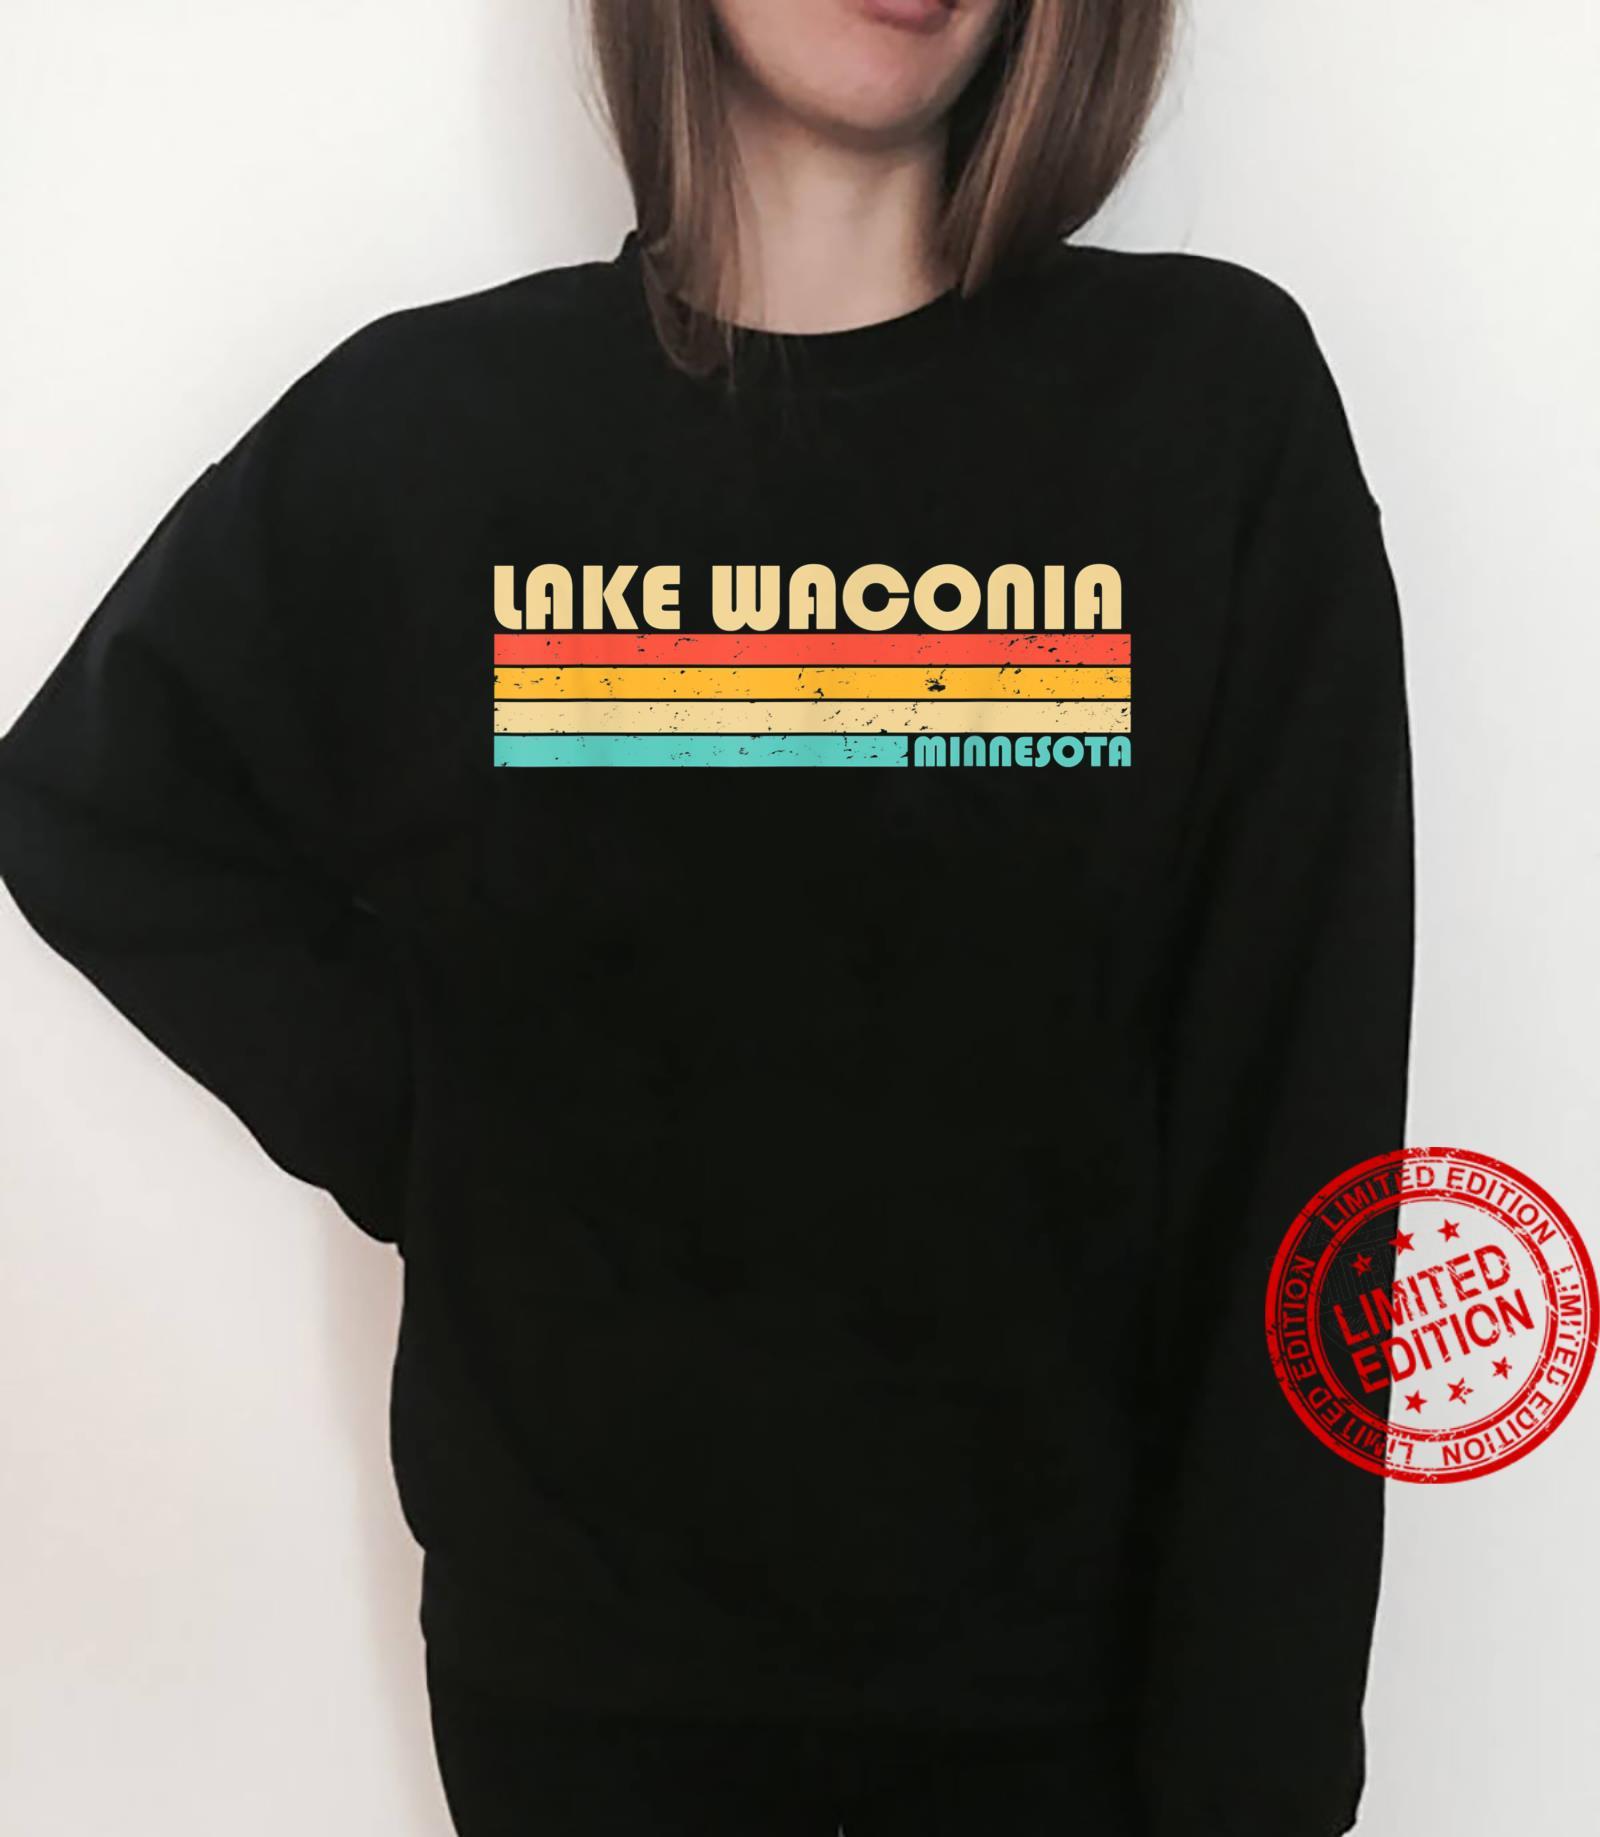 LAKE WACONIA MINNESOTA Fishing Camping Summer Shirt sweater